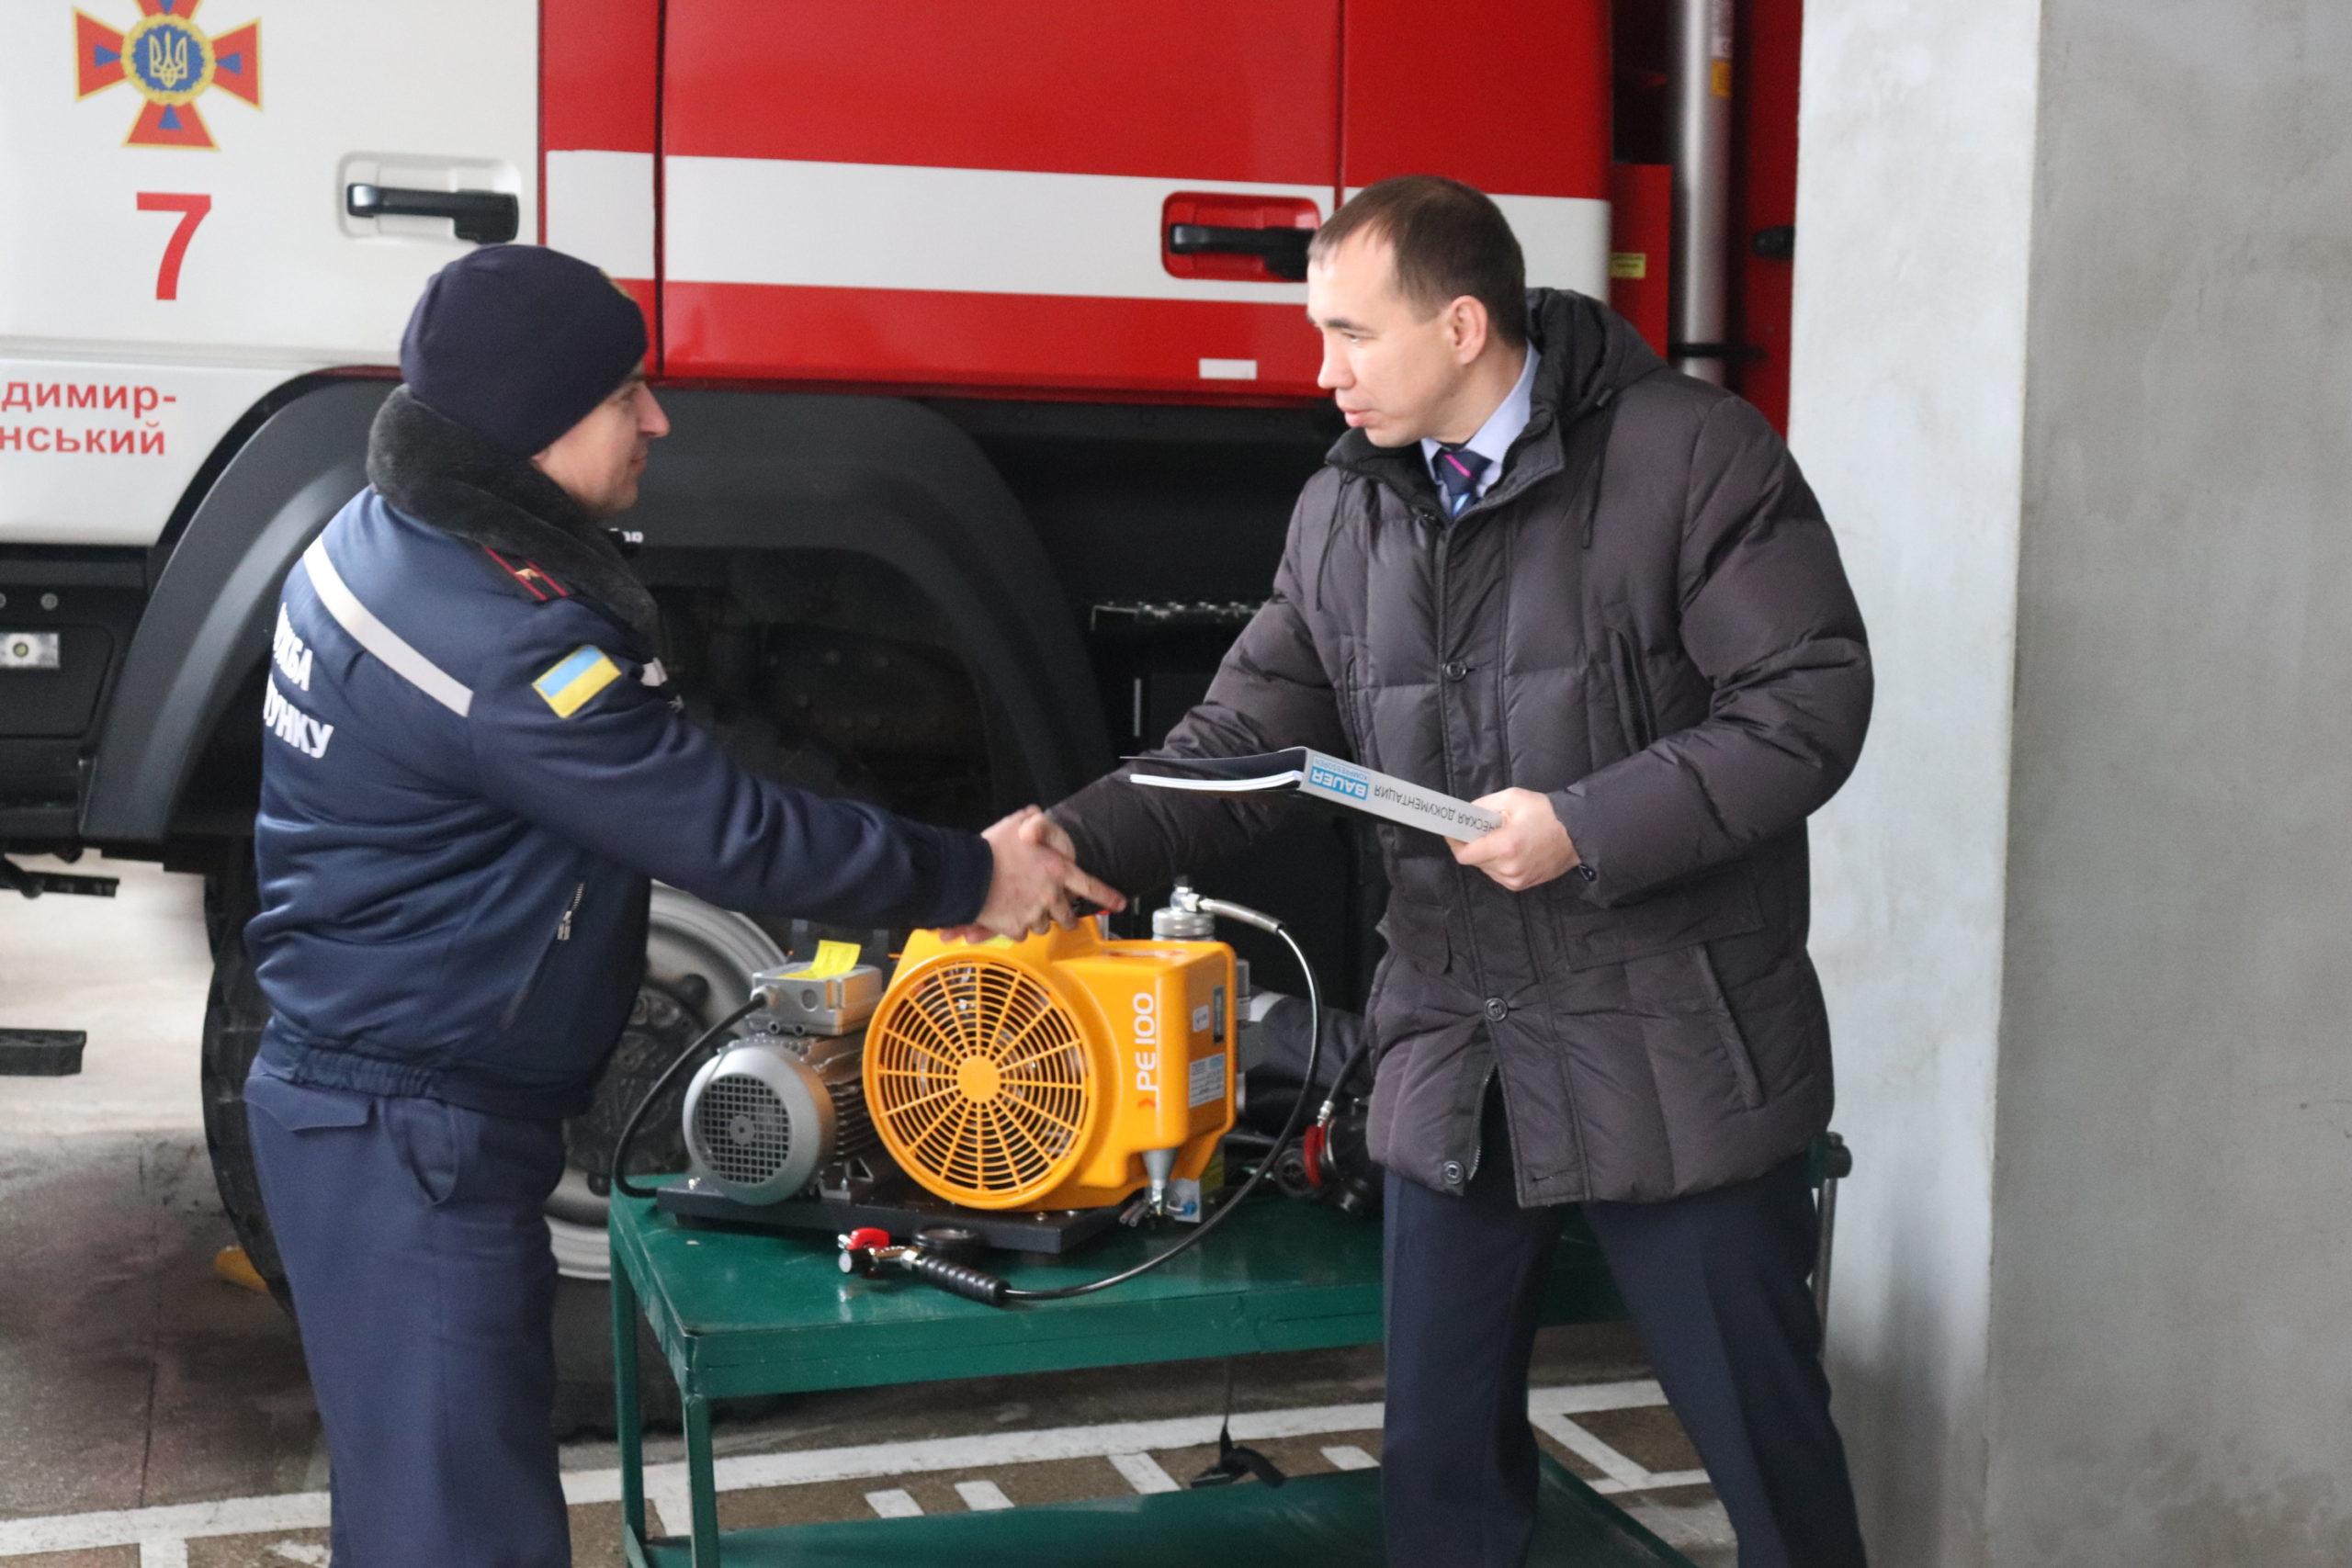 Волинським рятувальникам подарували потужний компресор